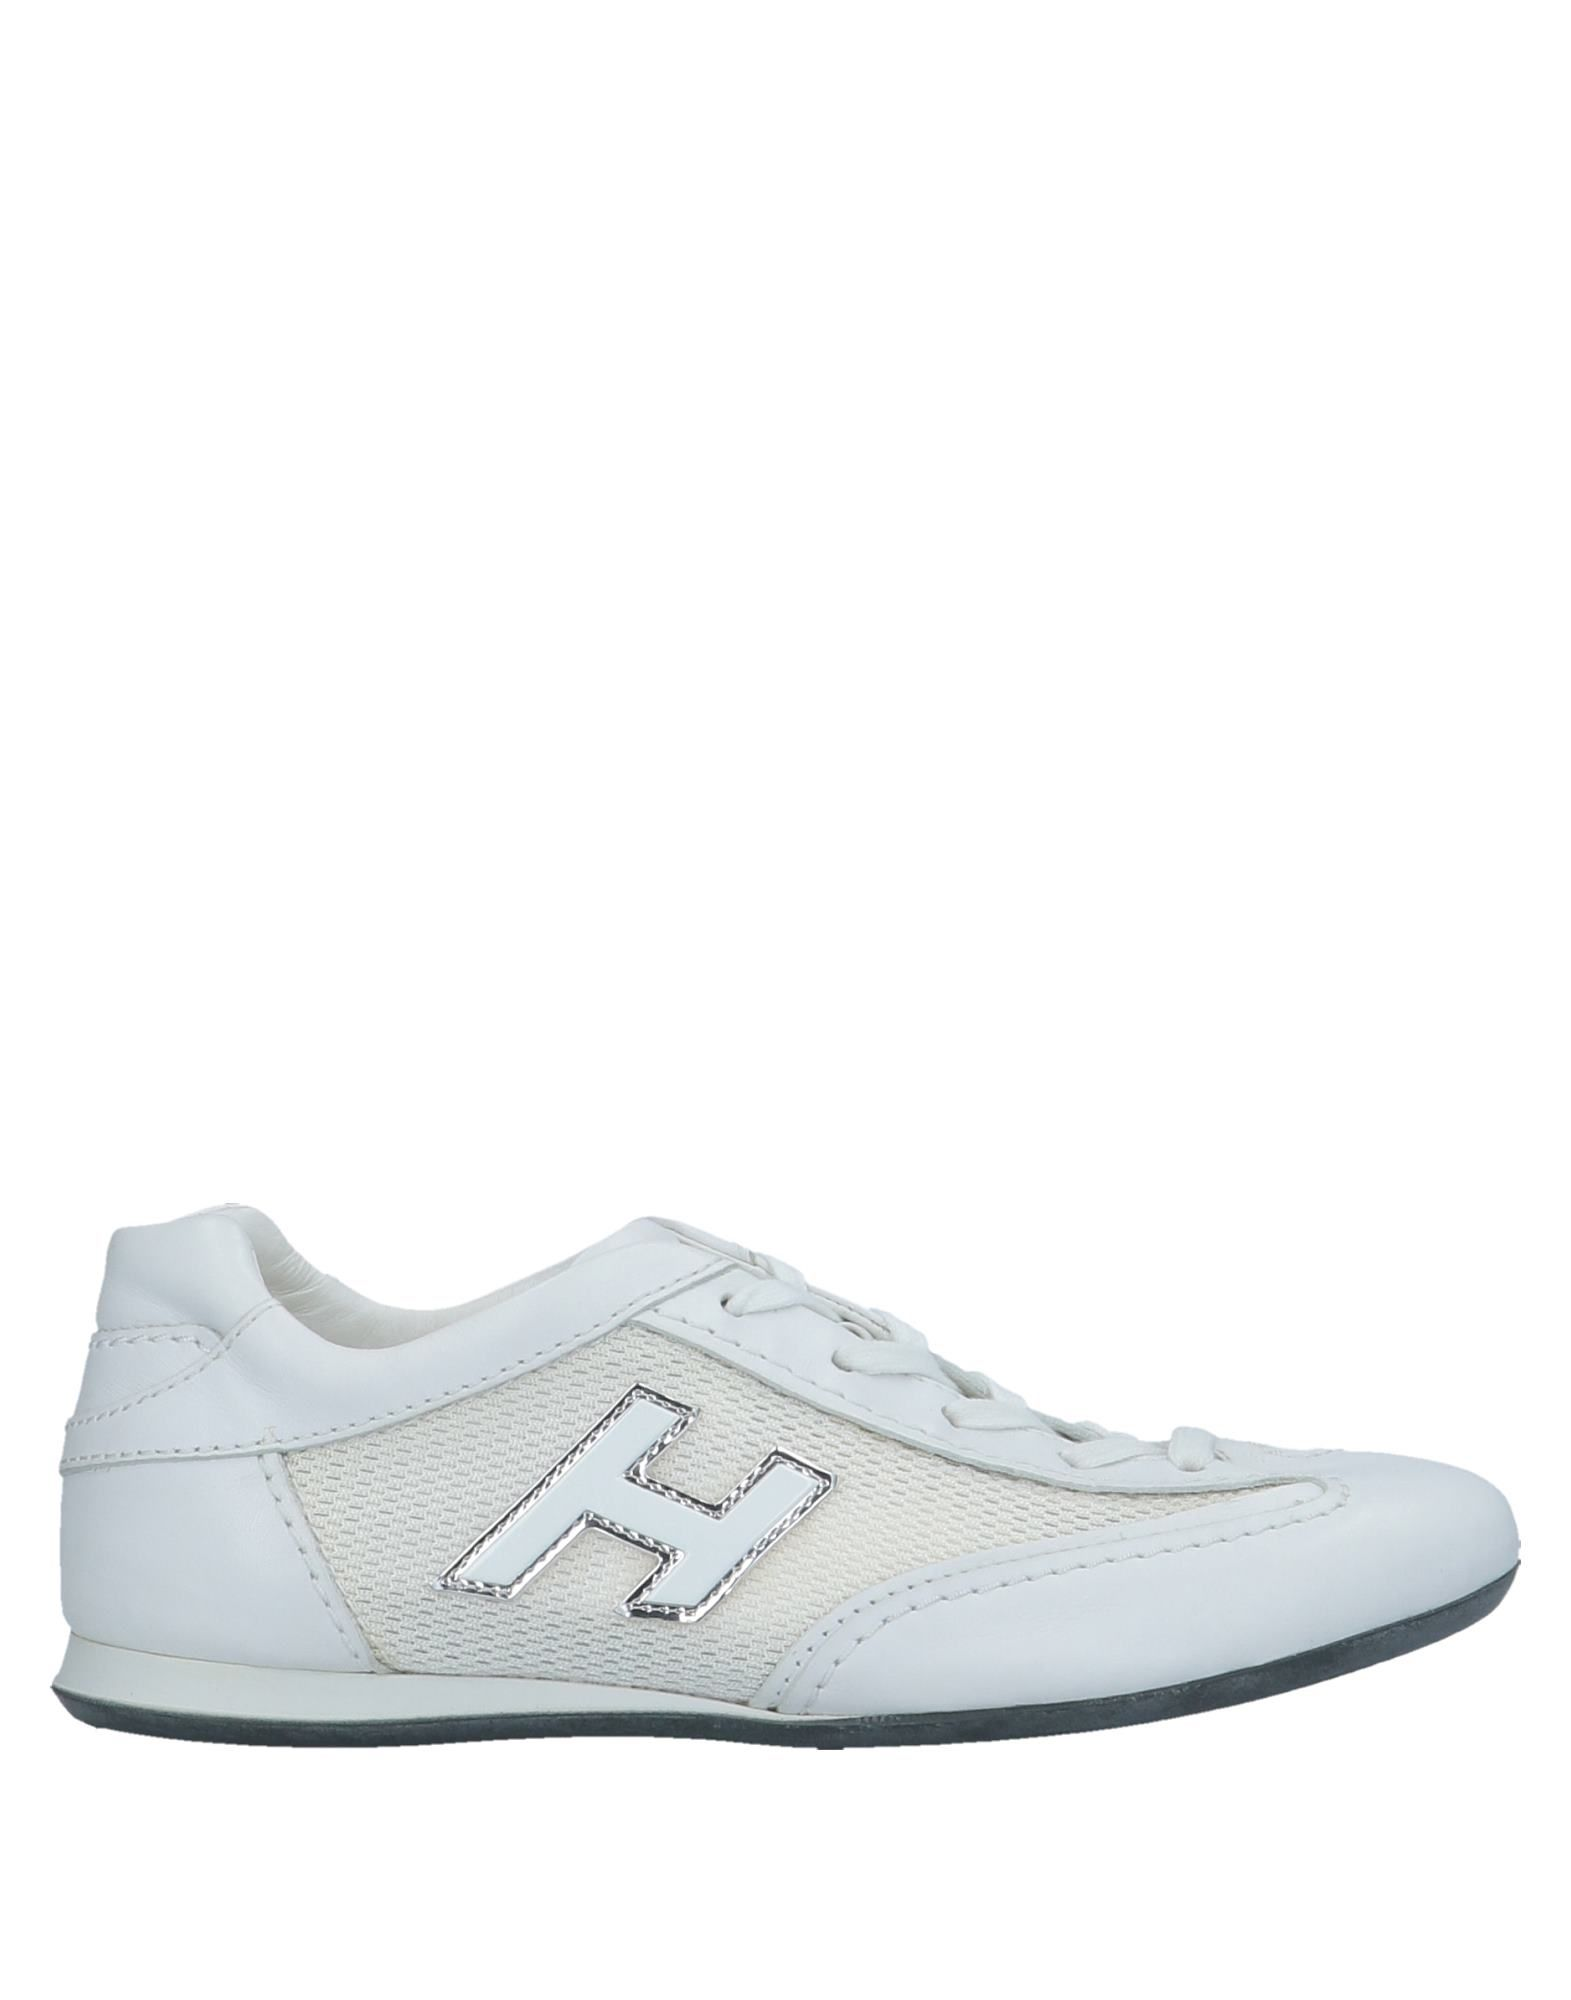 Sneakers Hogan Donna - 11517203KG elegante